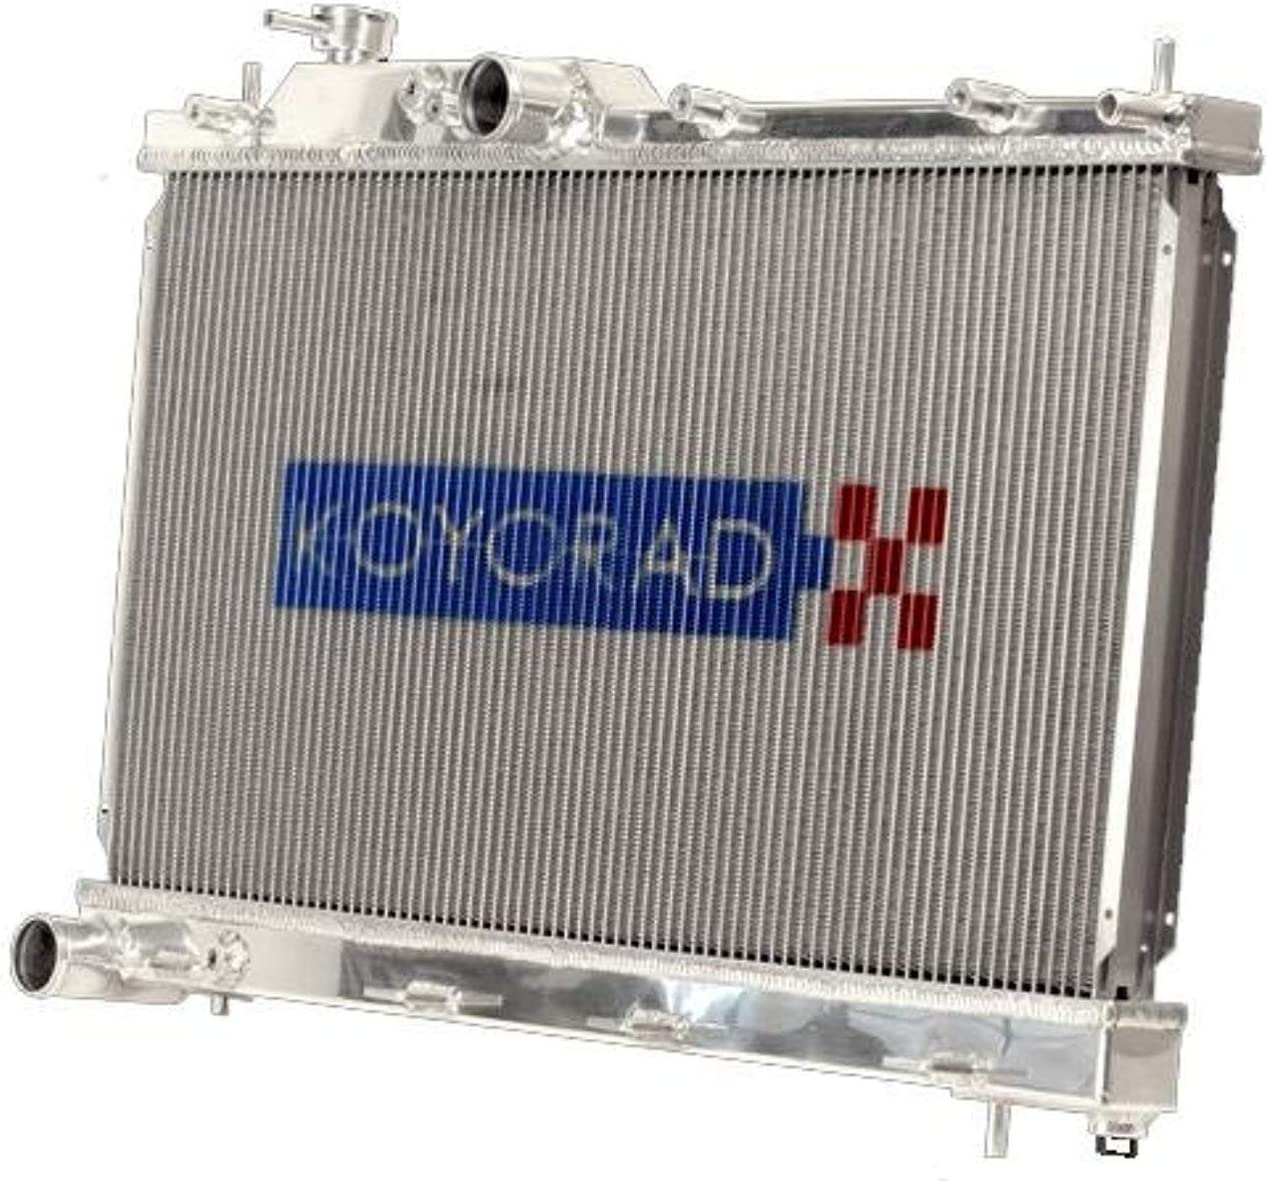 Amazon.com: Koyo VH13026 Radiator (Hyper V-Series): AutomotiveAmazon.com